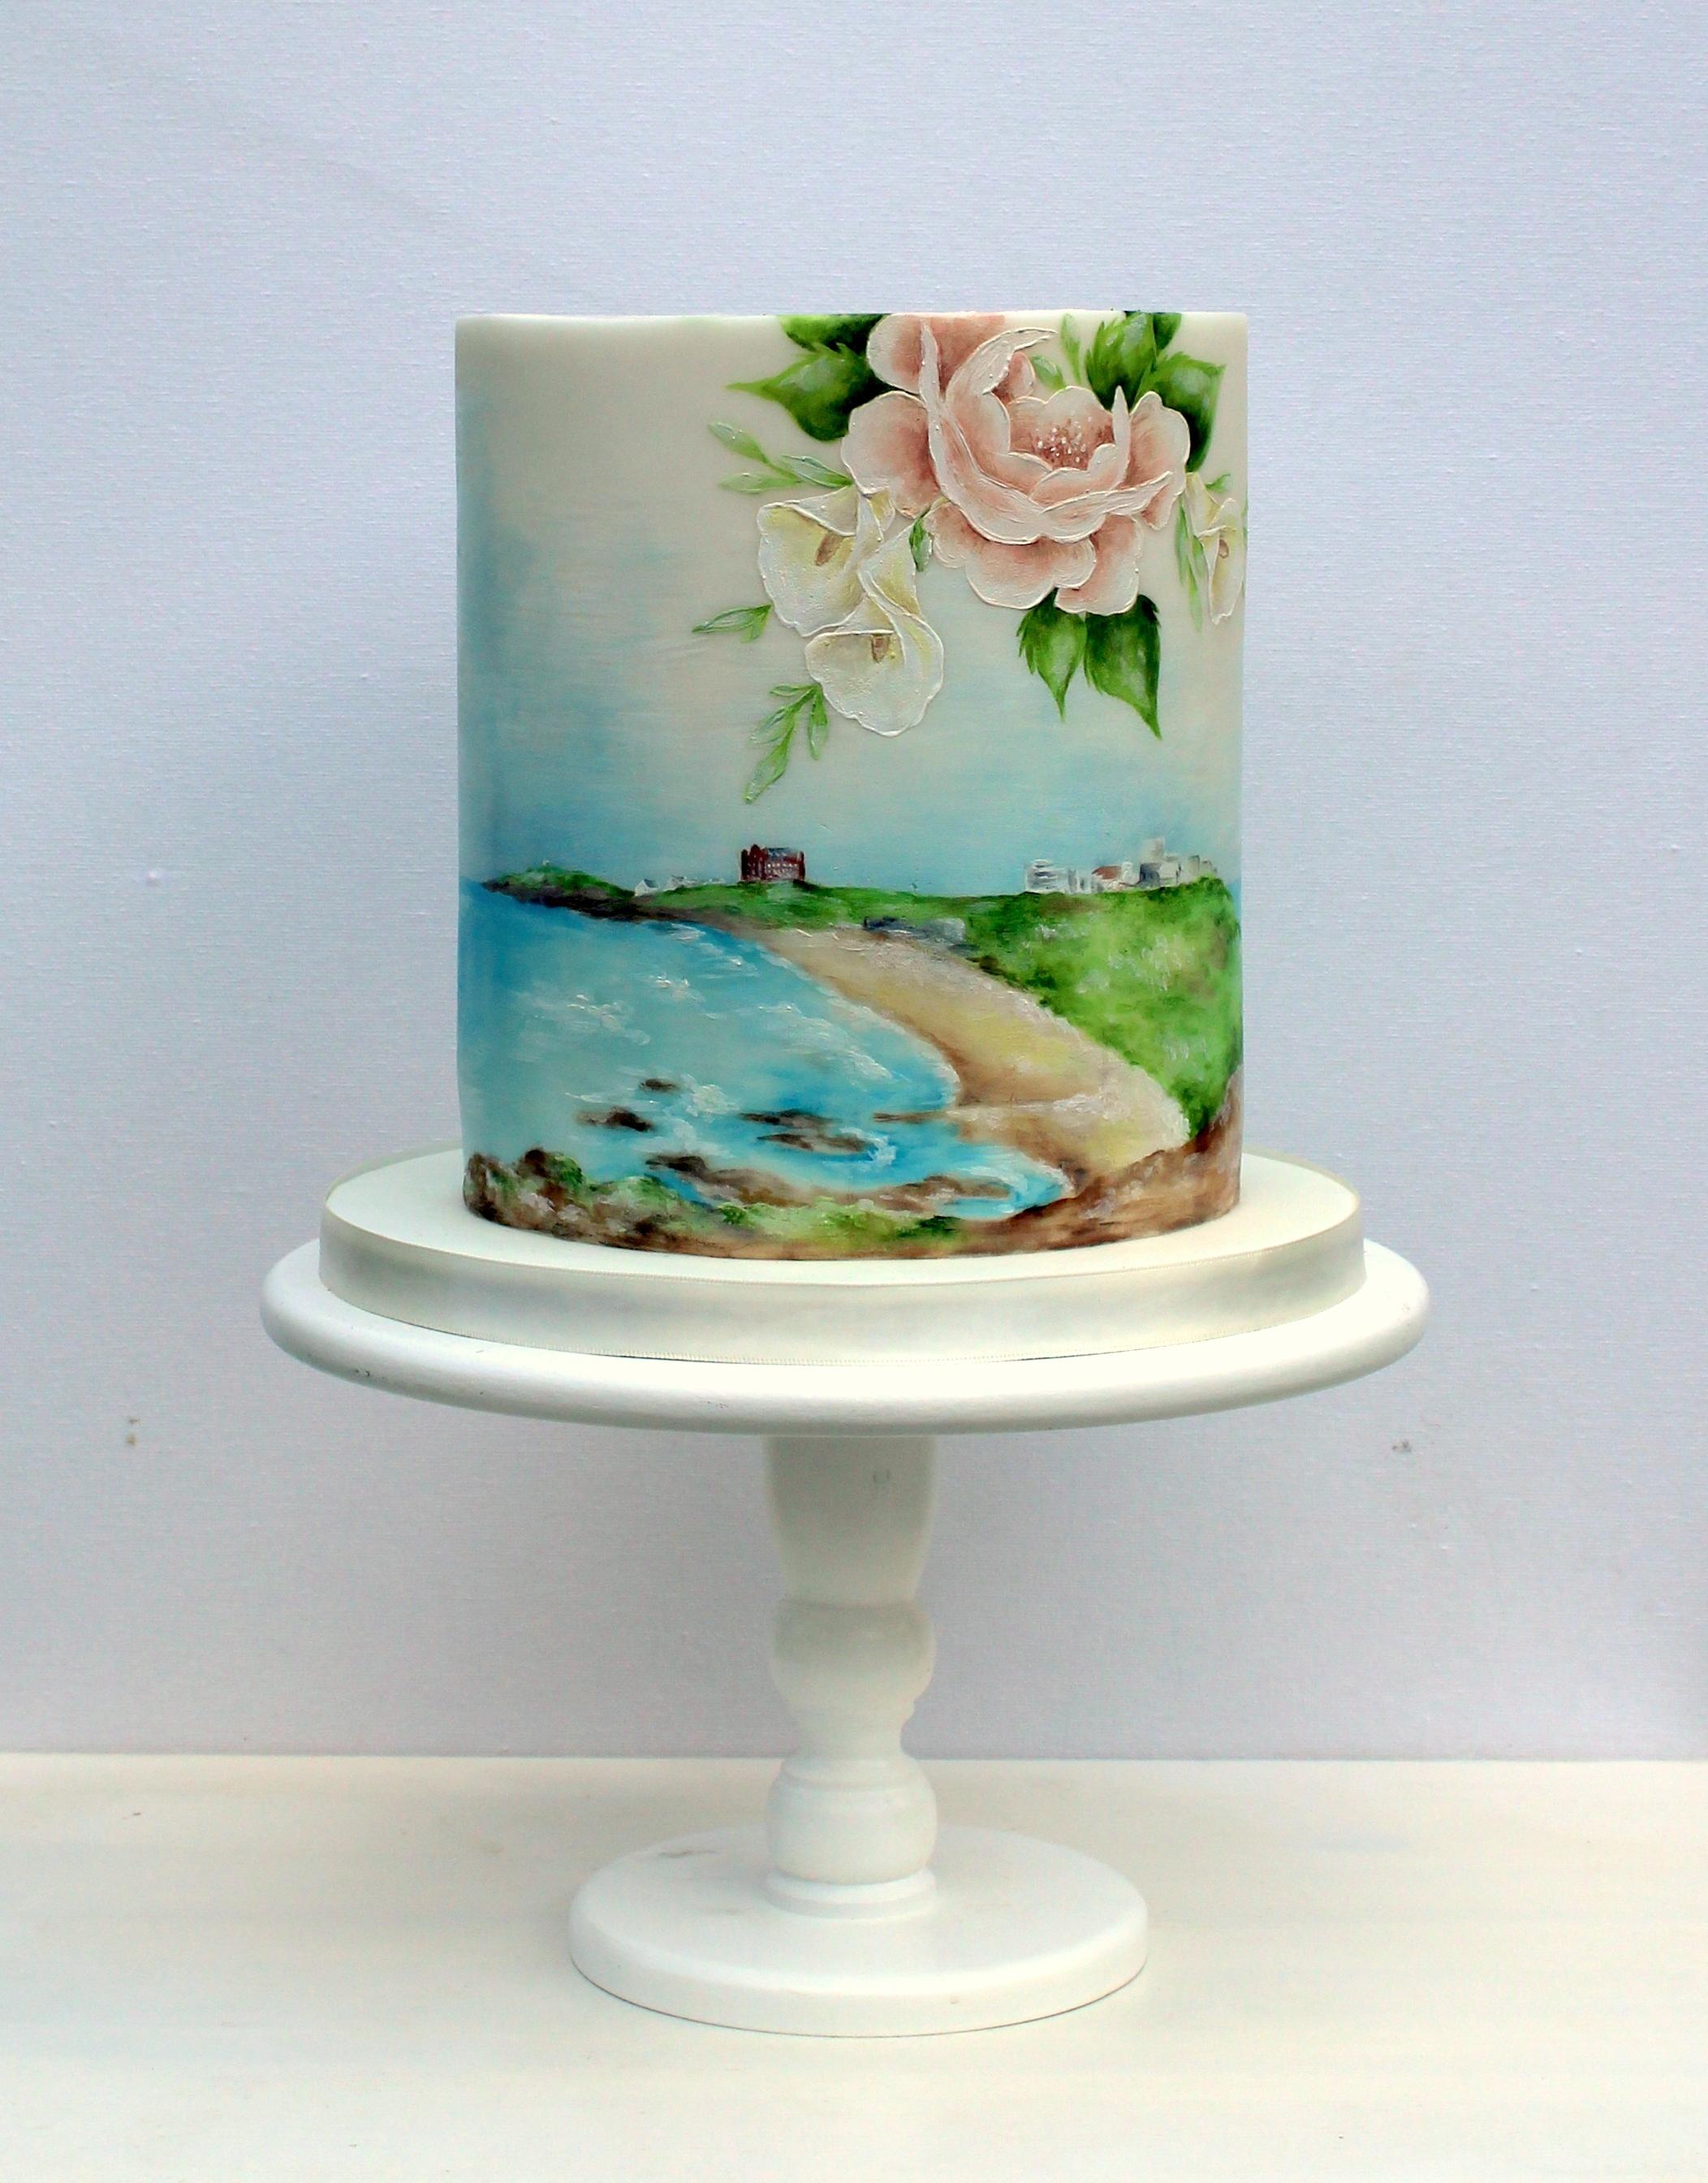 fistral beach cake.JPG